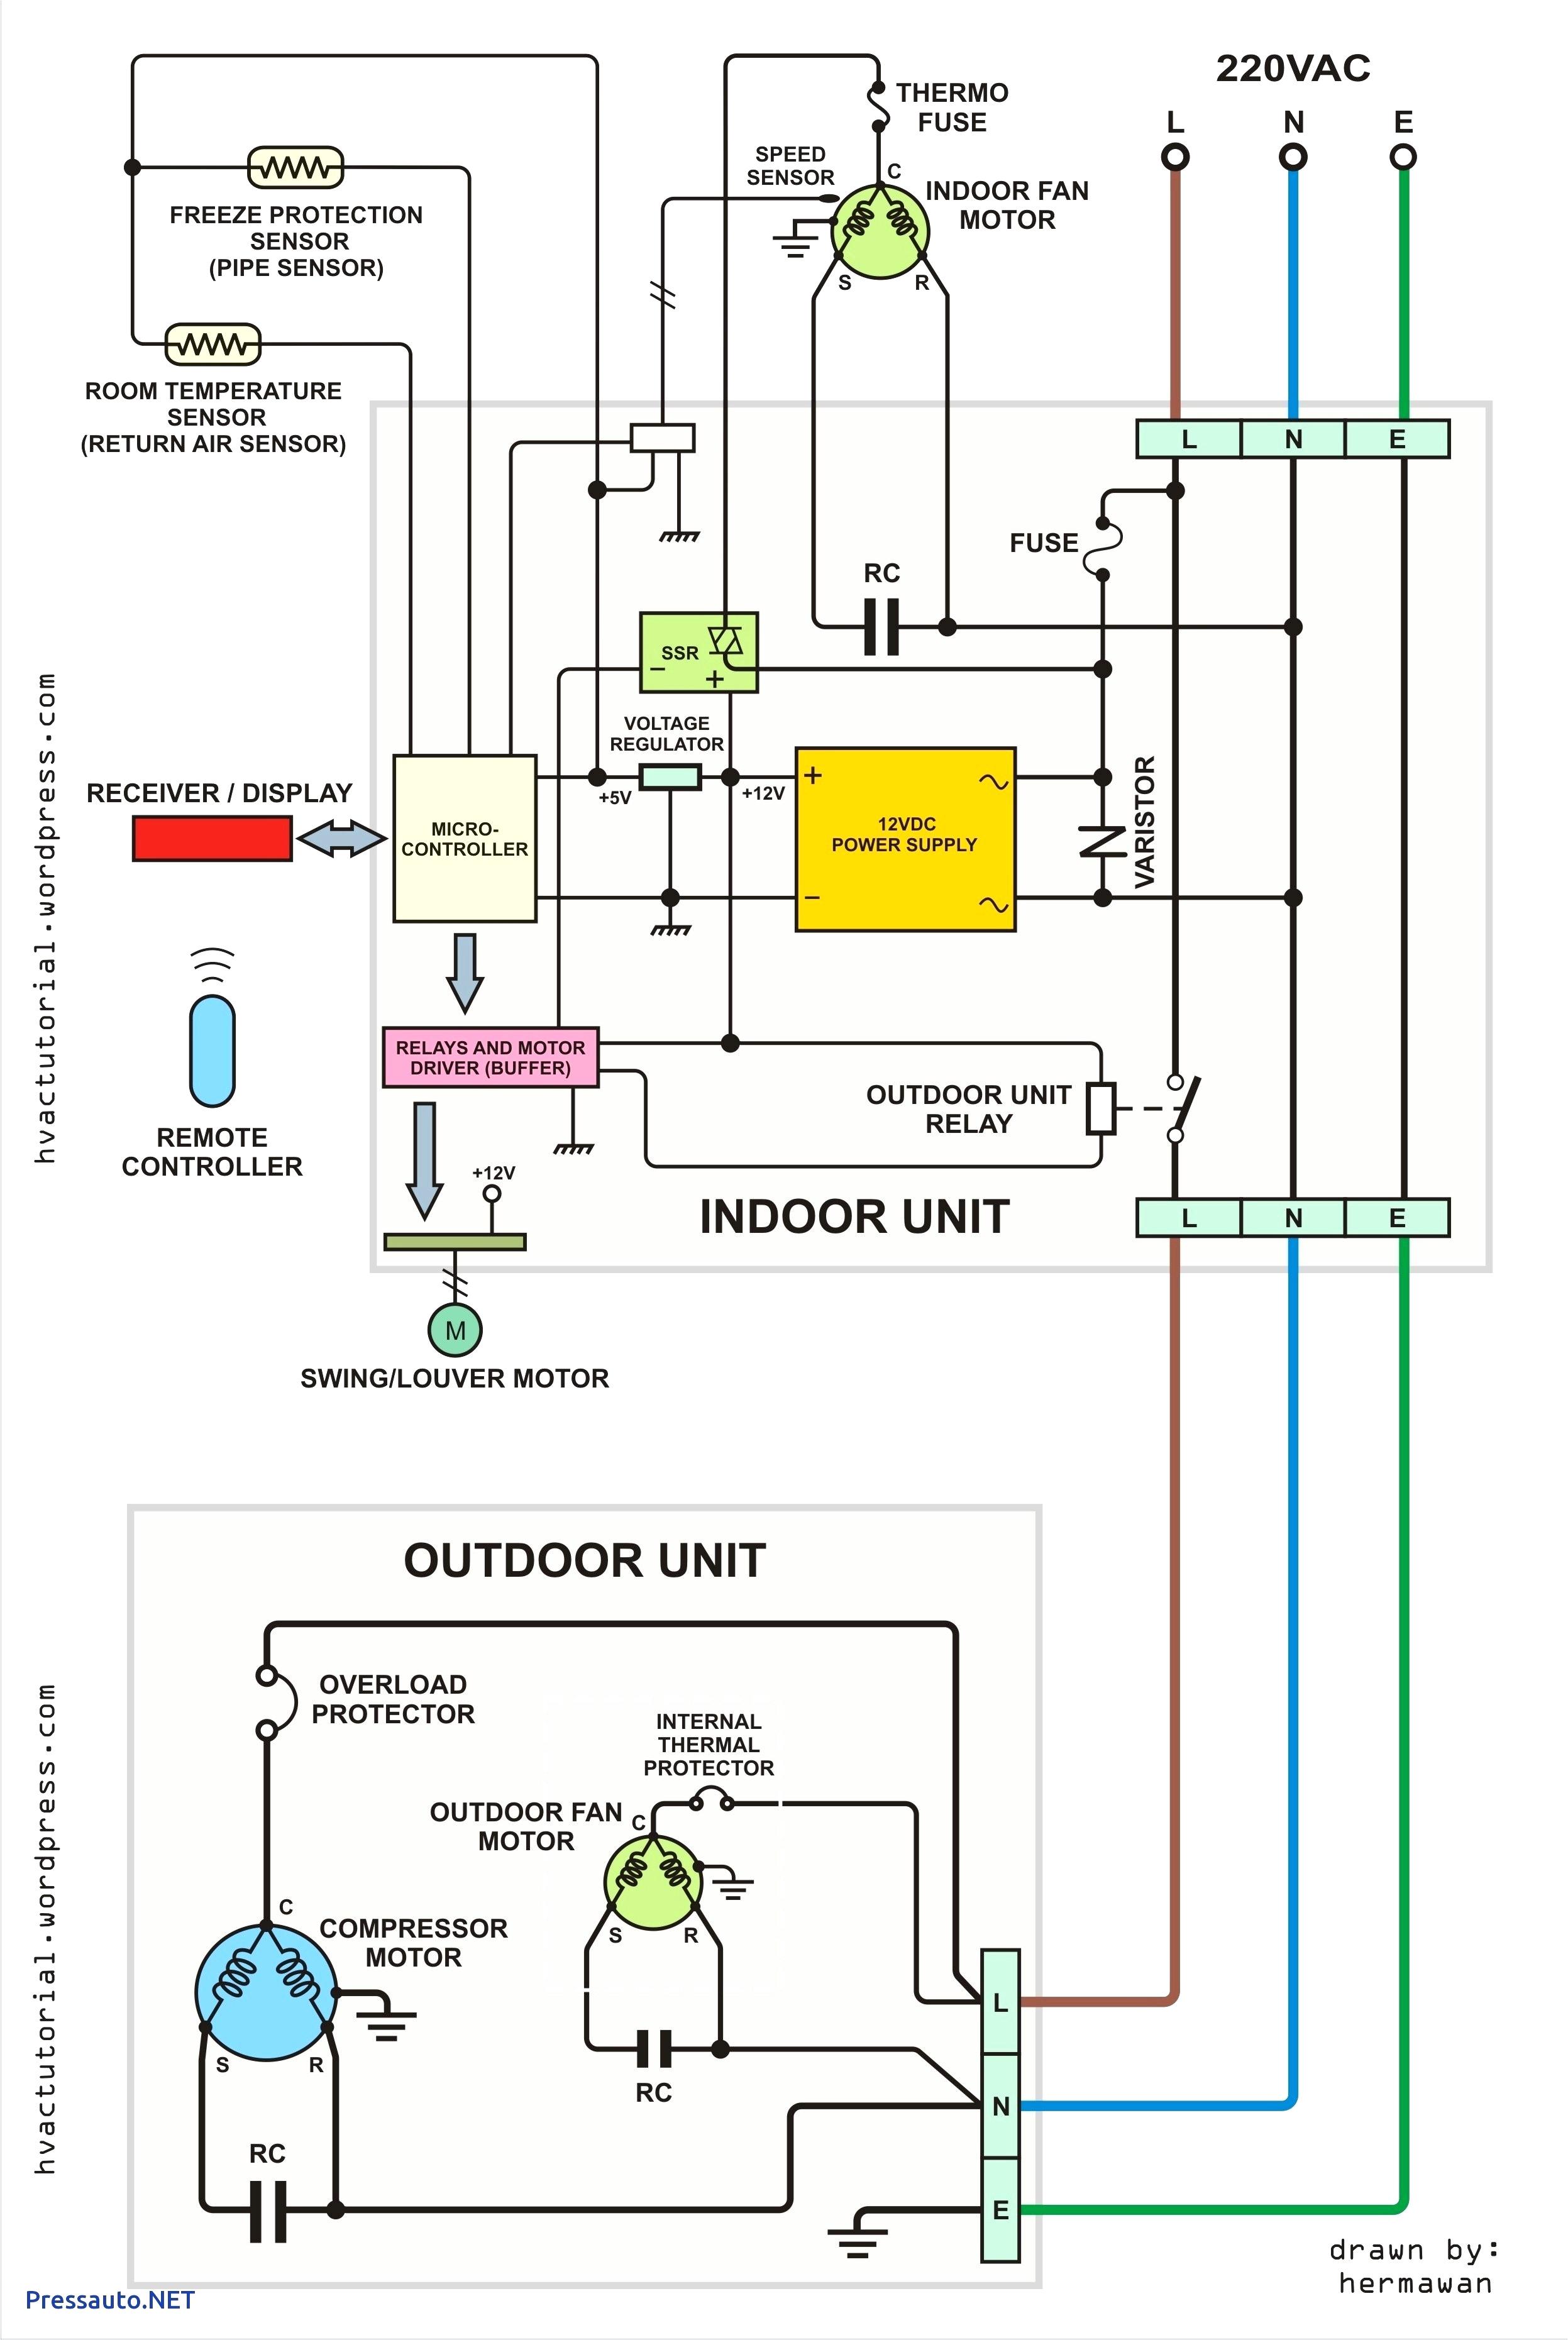 dutchmen wiring diagrams wiring diagram repair guides beaver wiring diagrams